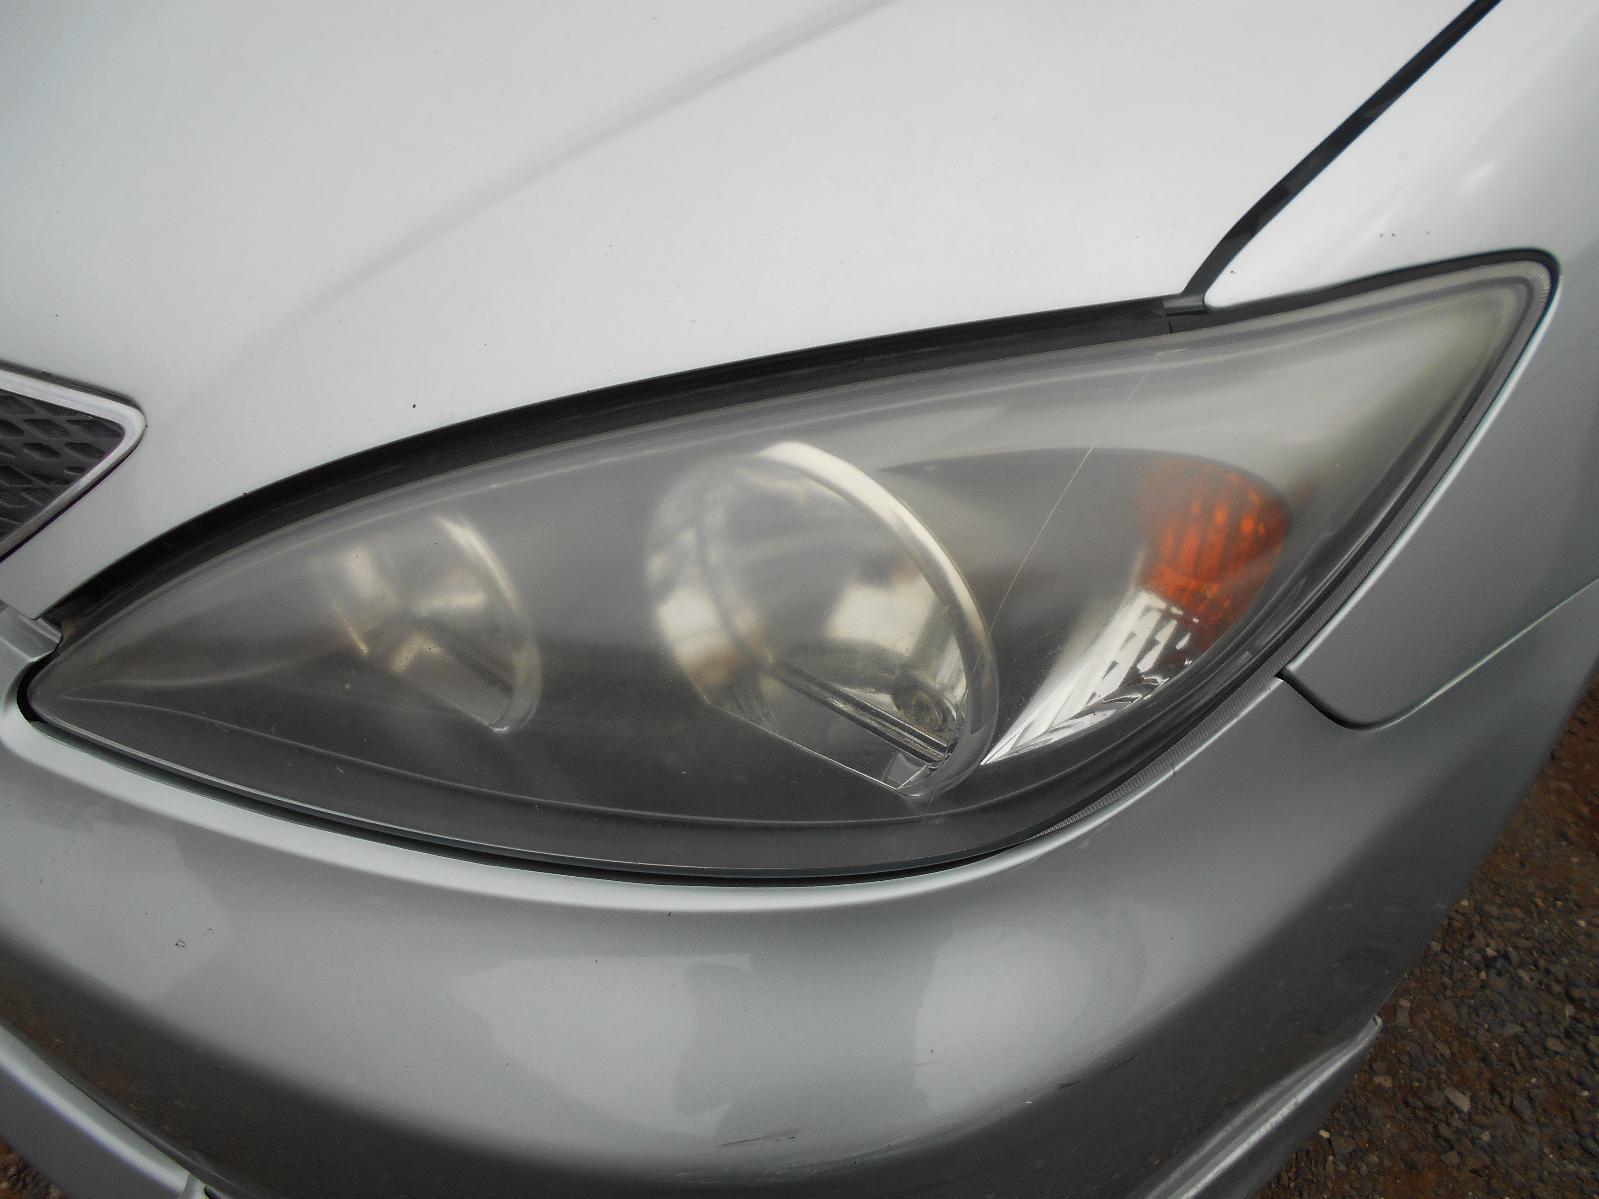 TOYOTA CAMRY, Left Headlamp, SK36, SPORTIVO, BLACK INSERT TYPE, 08/02-09/04